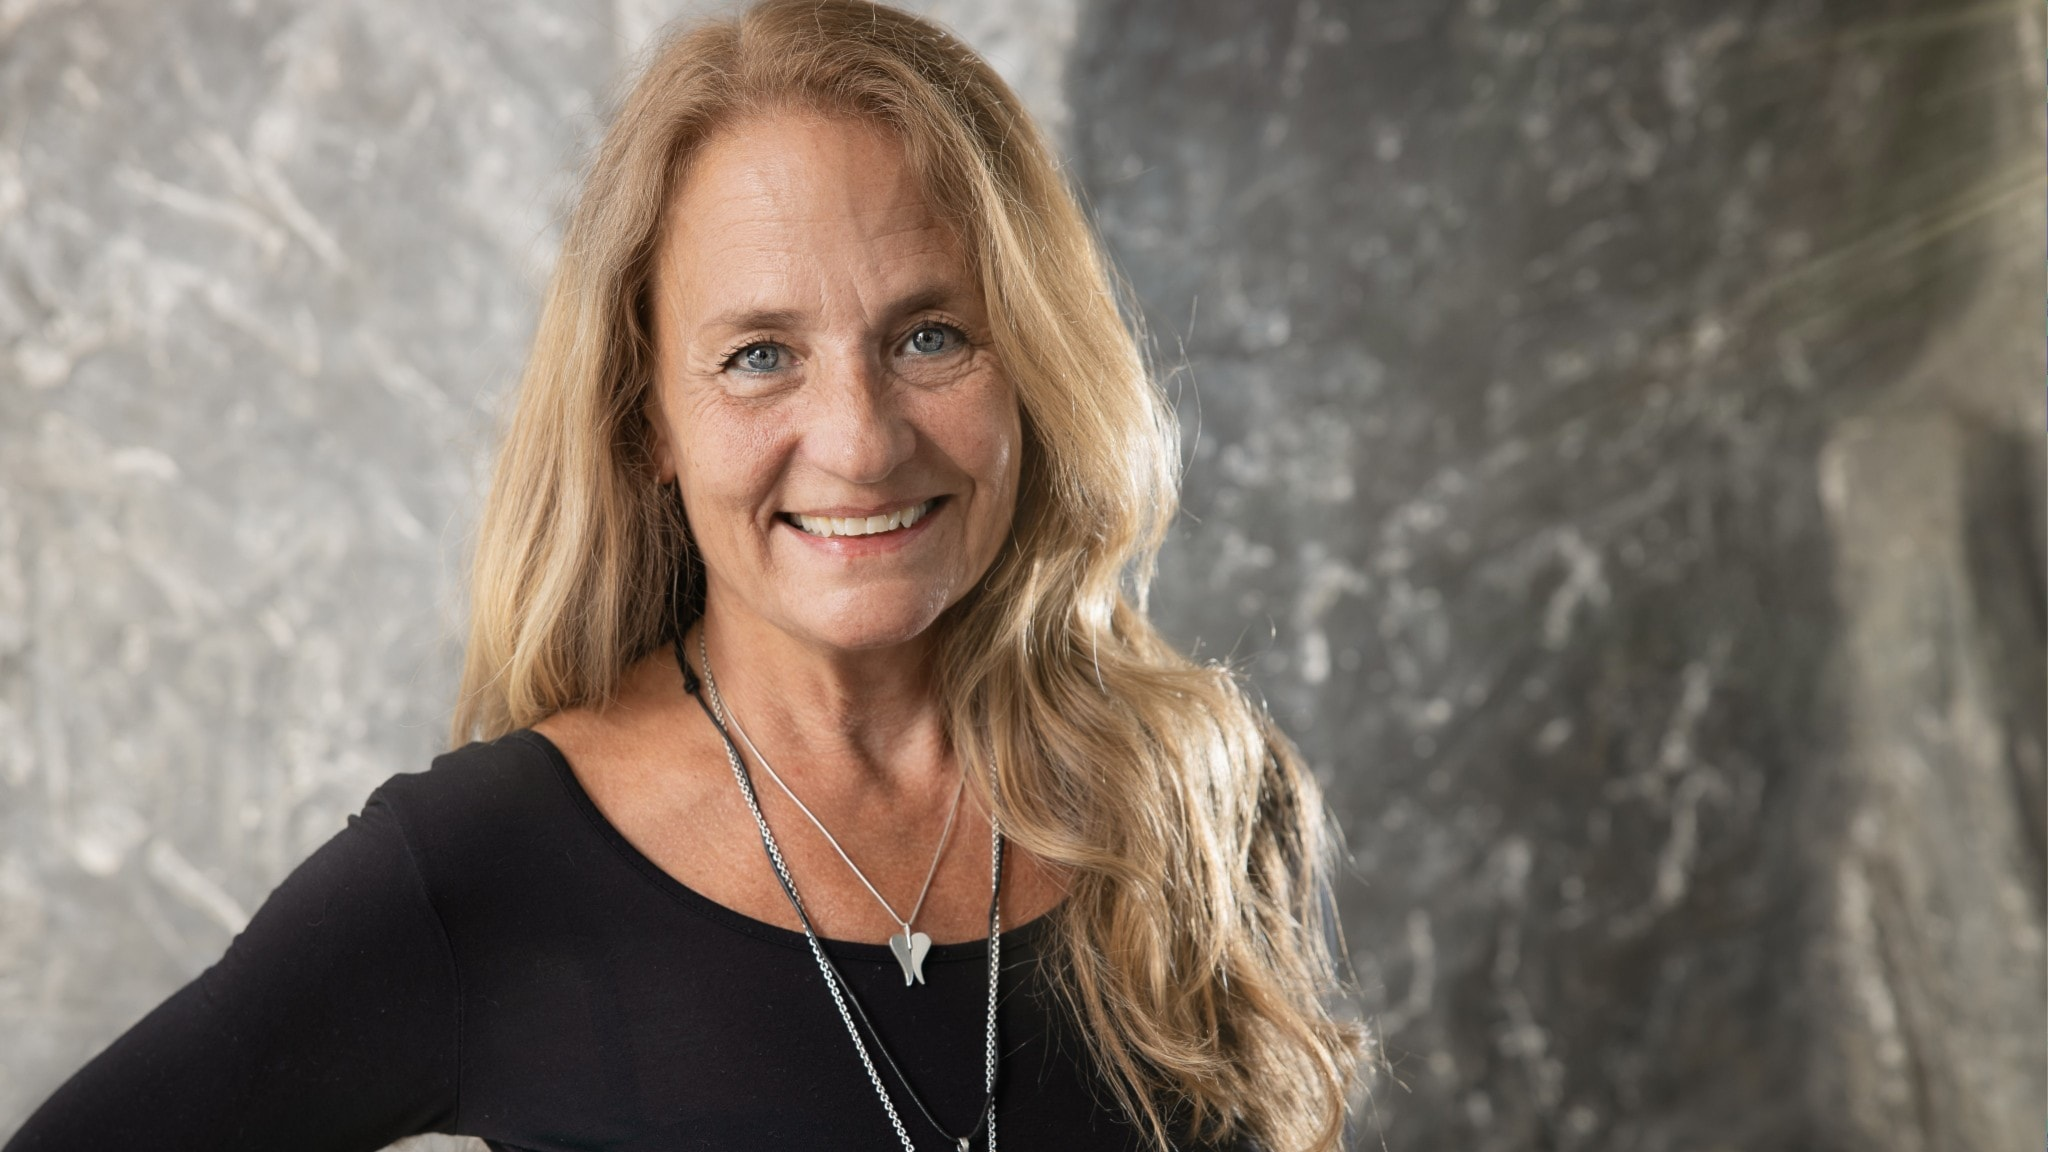 Susanne Tellinger